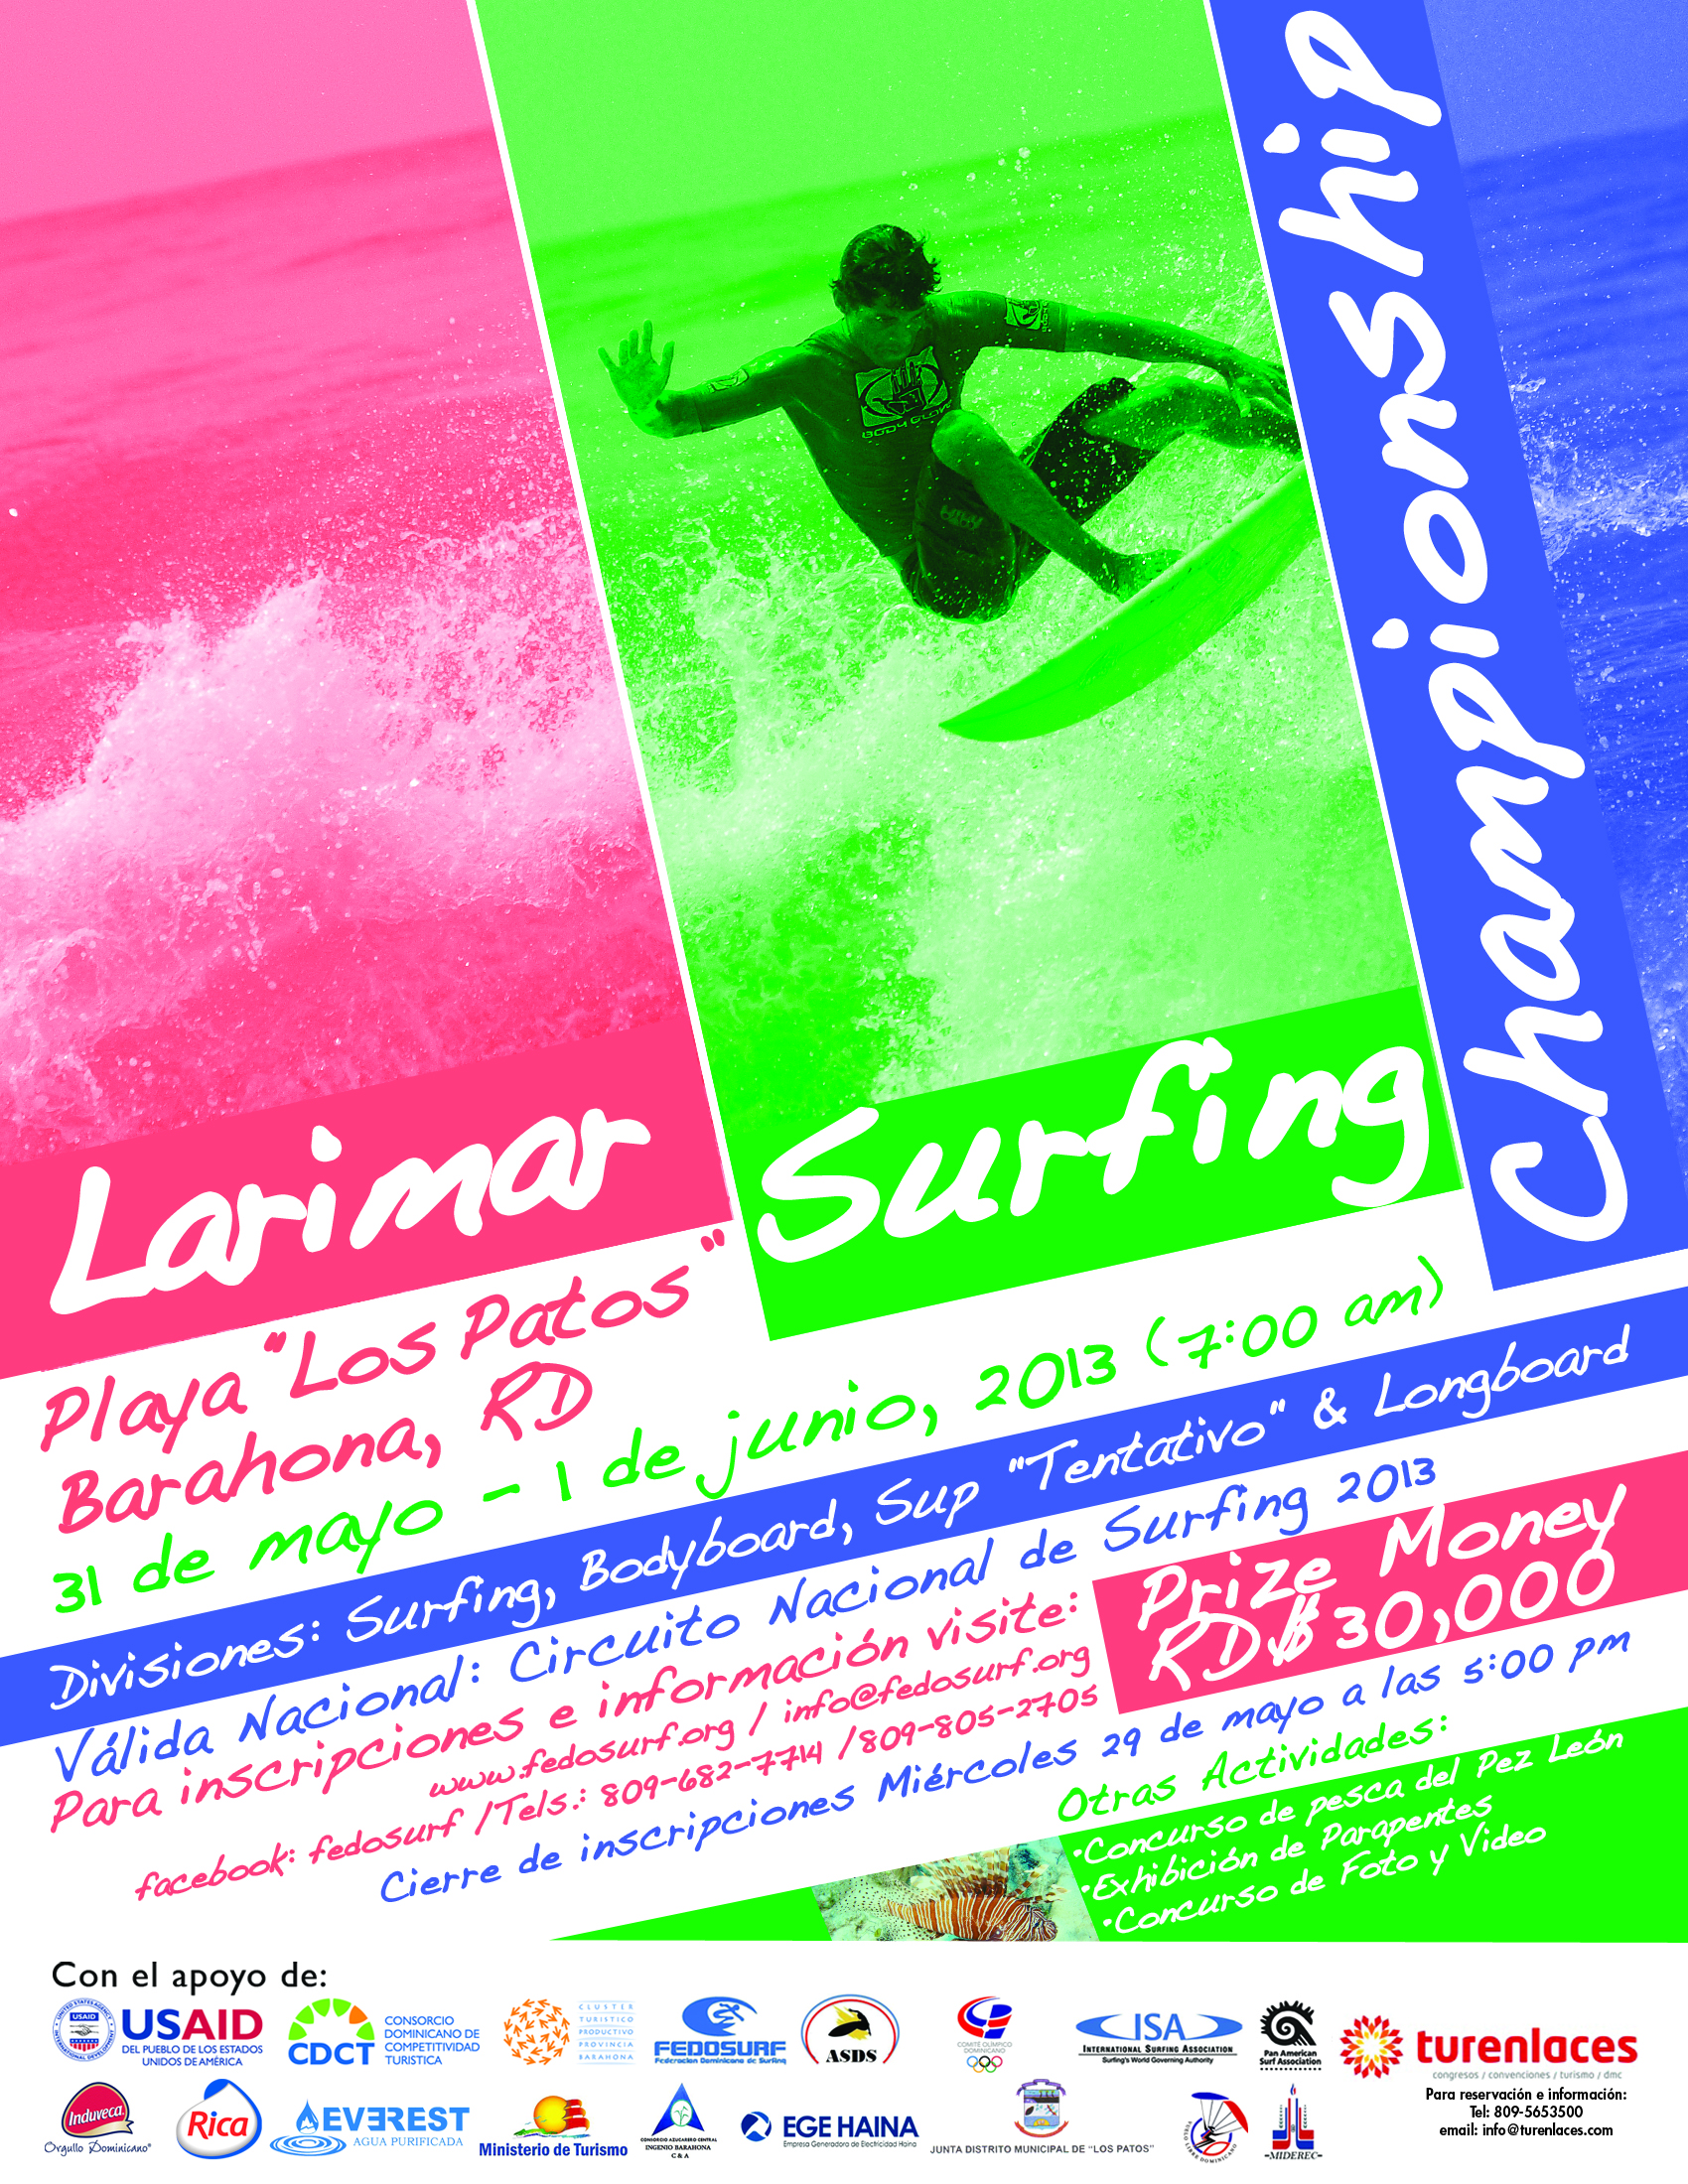 Surf in Los Patos Barahona Dominican Republic FEDOSURF